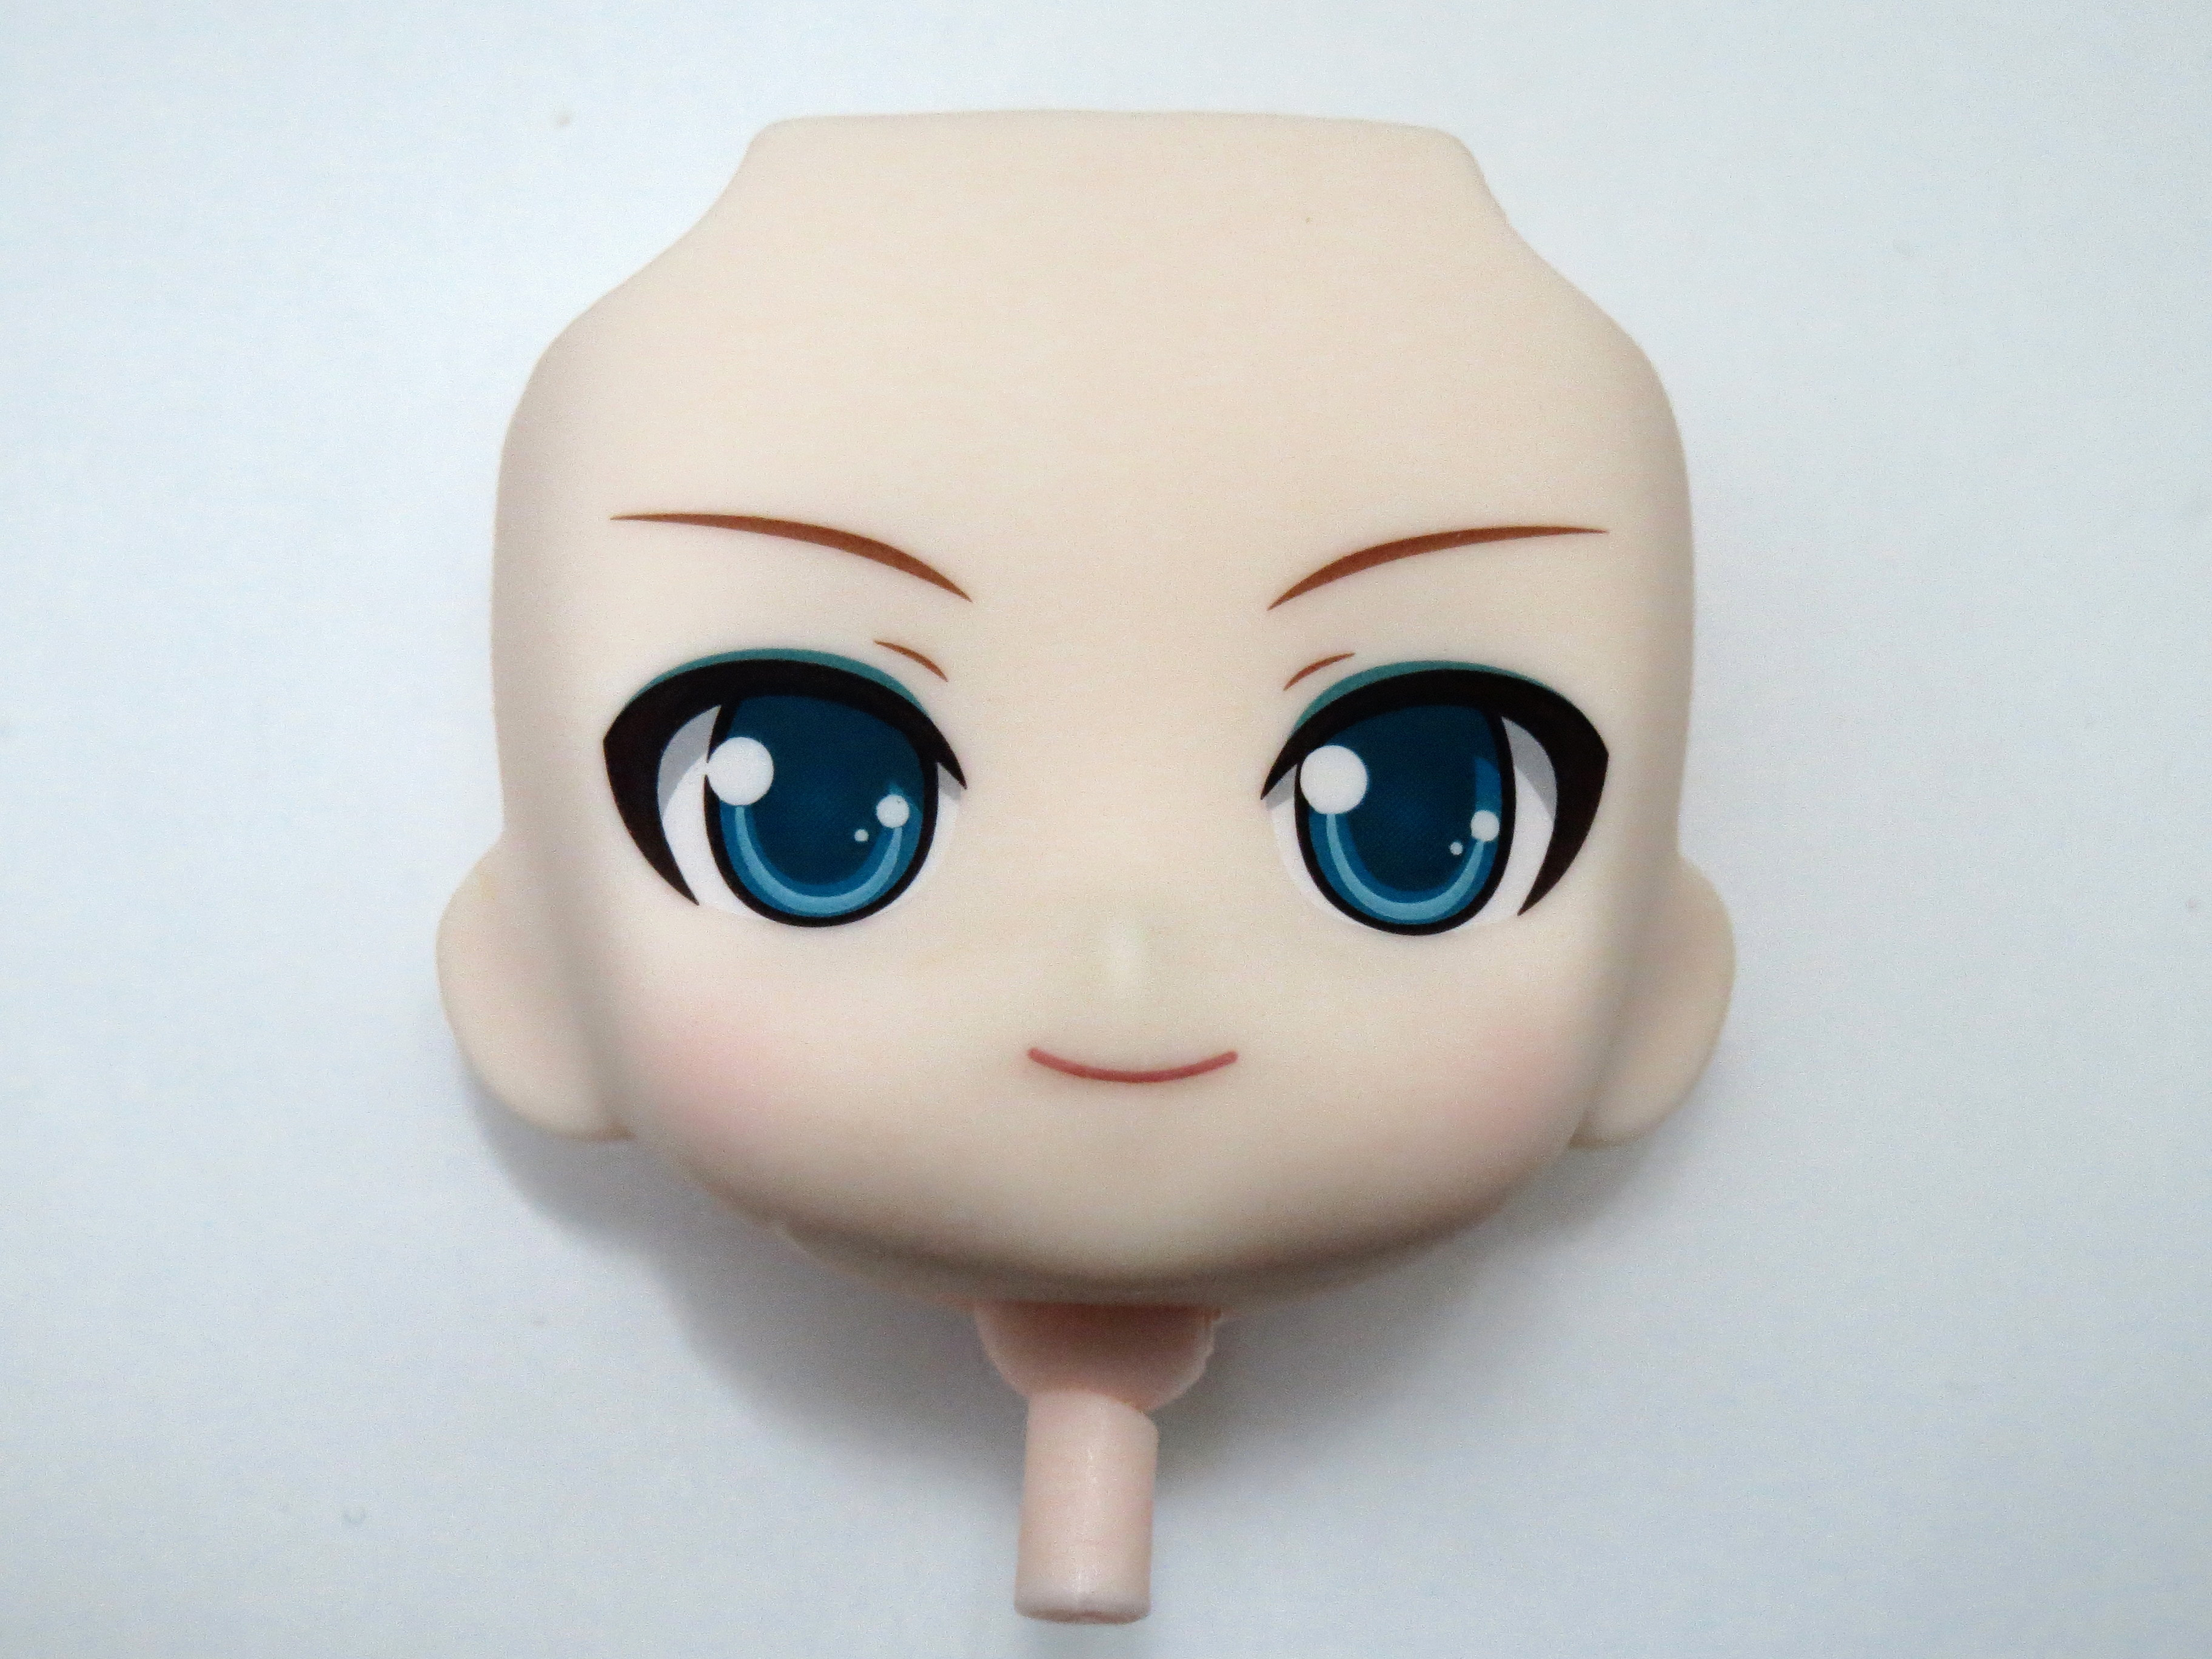 【286】 Lily from anim.o.v.e 顔パーツ 普通 ねんどろいど